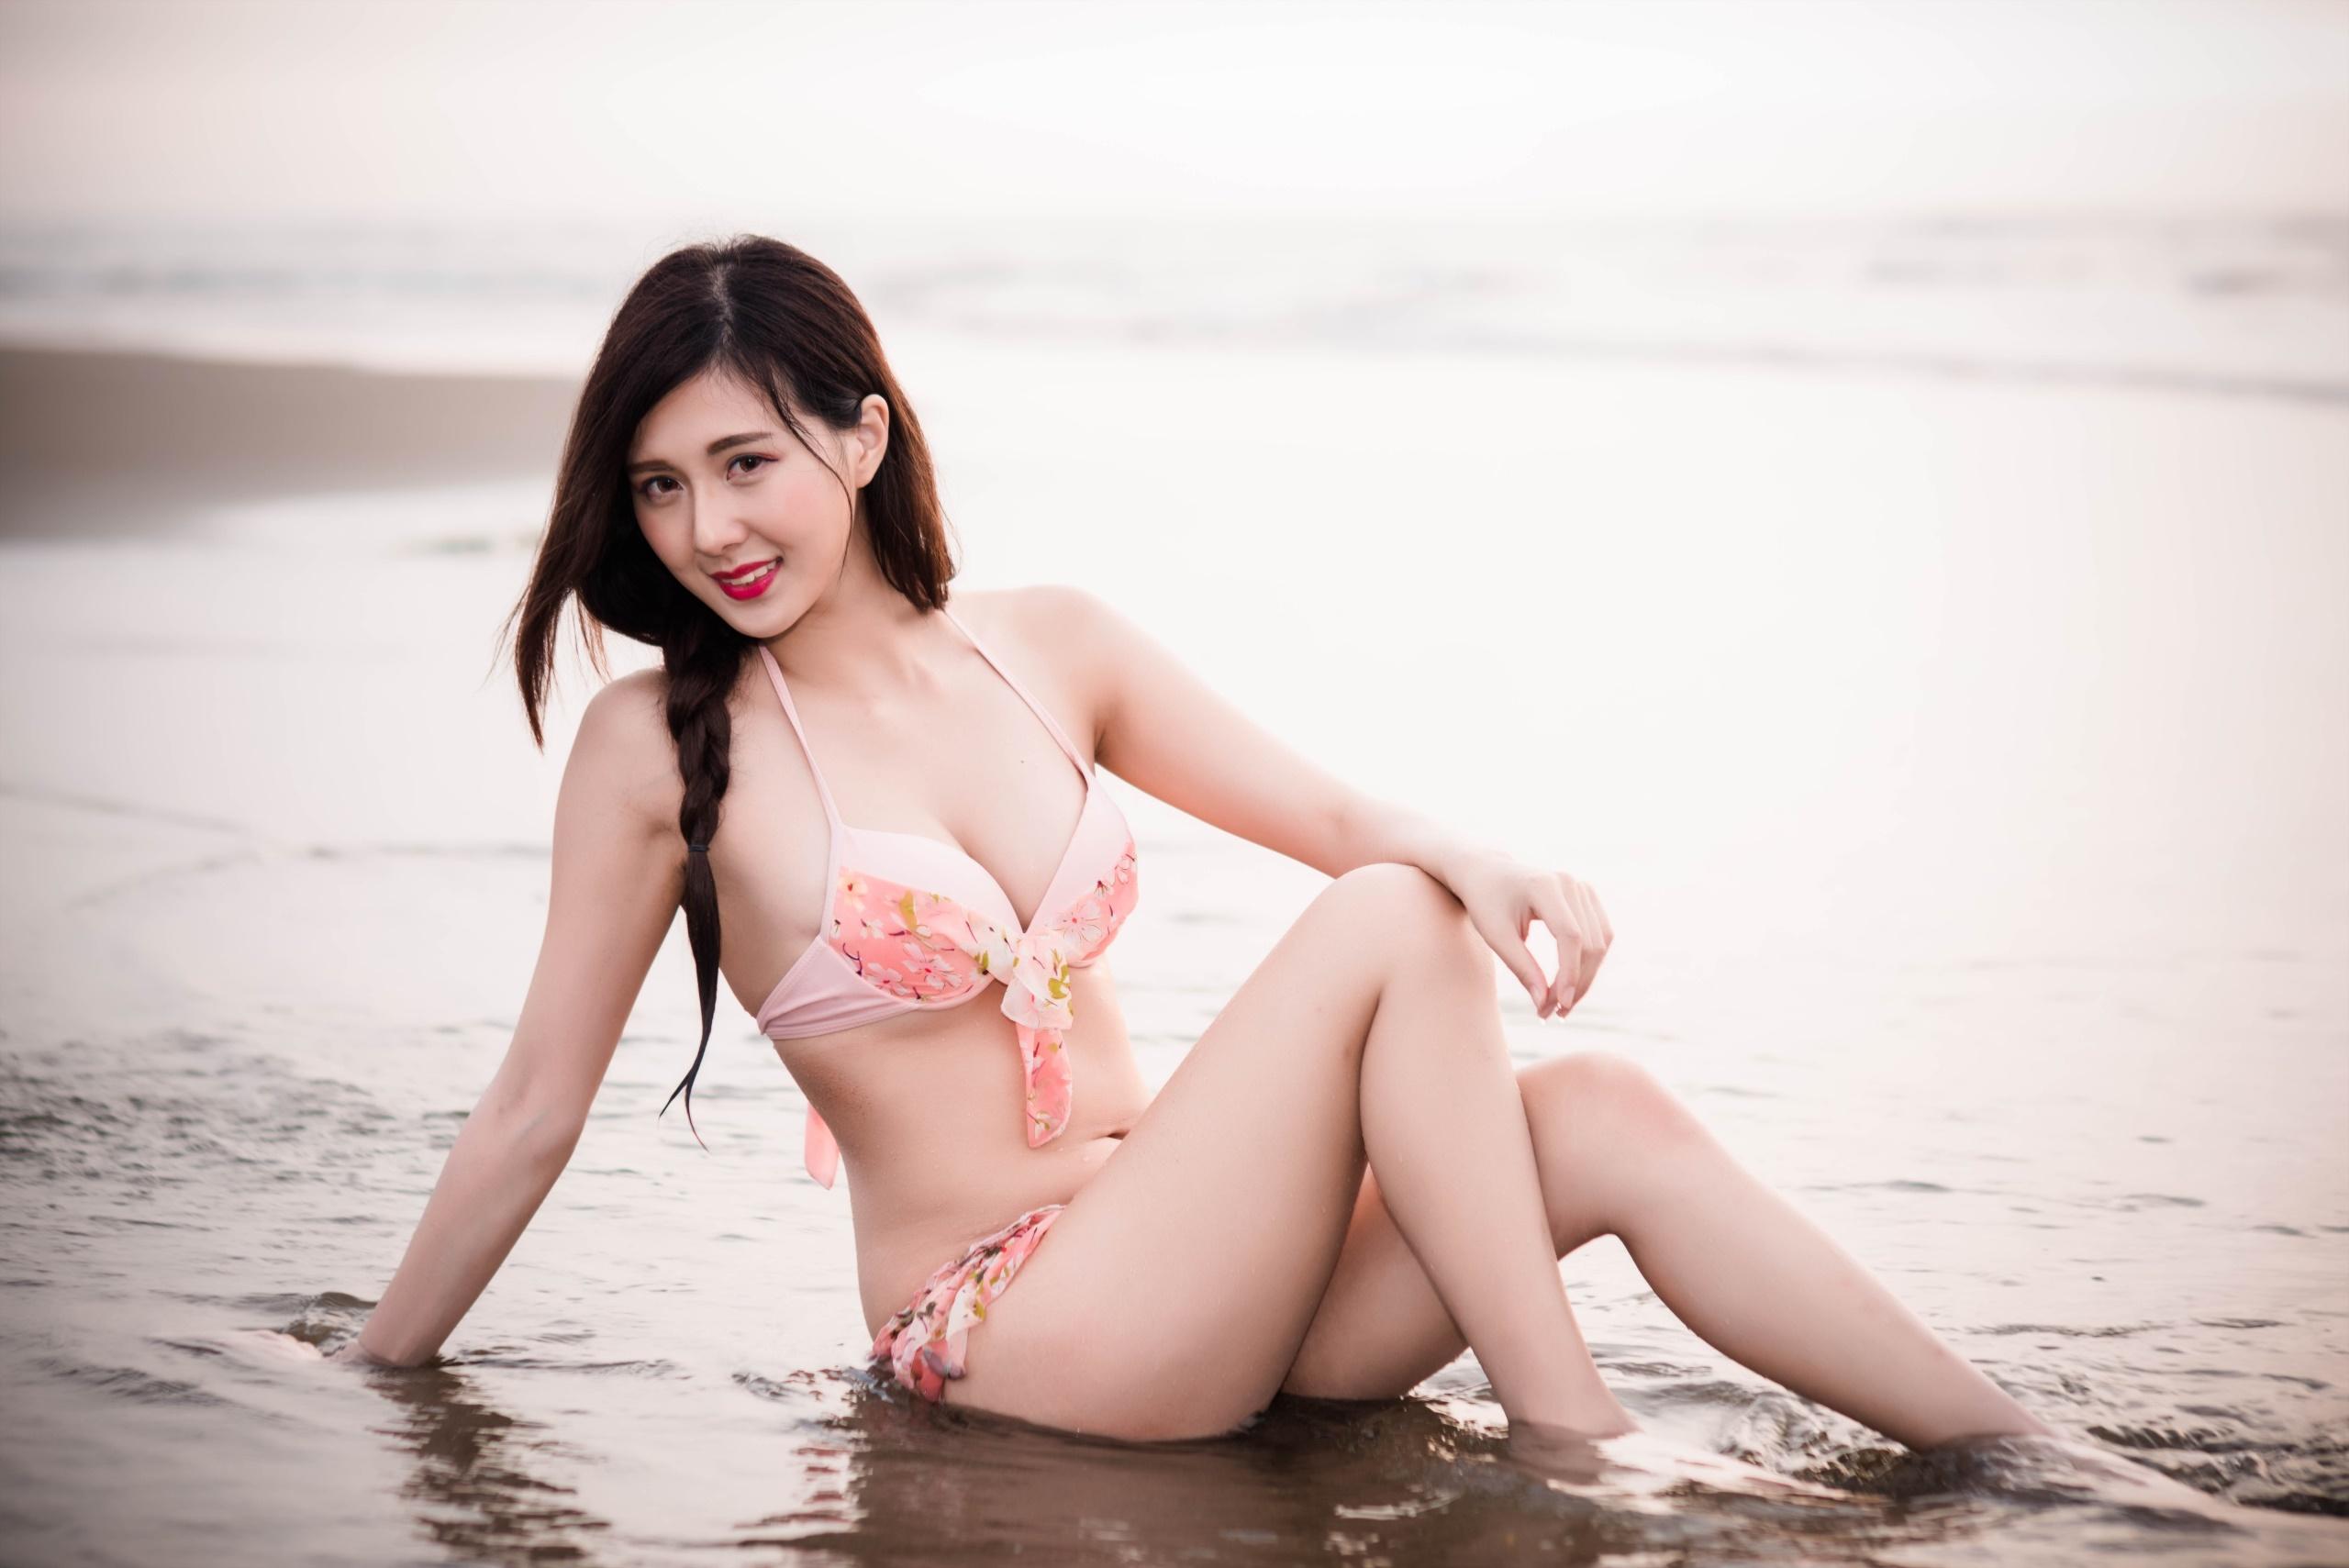 Japanese bikini girl wallpapers 6